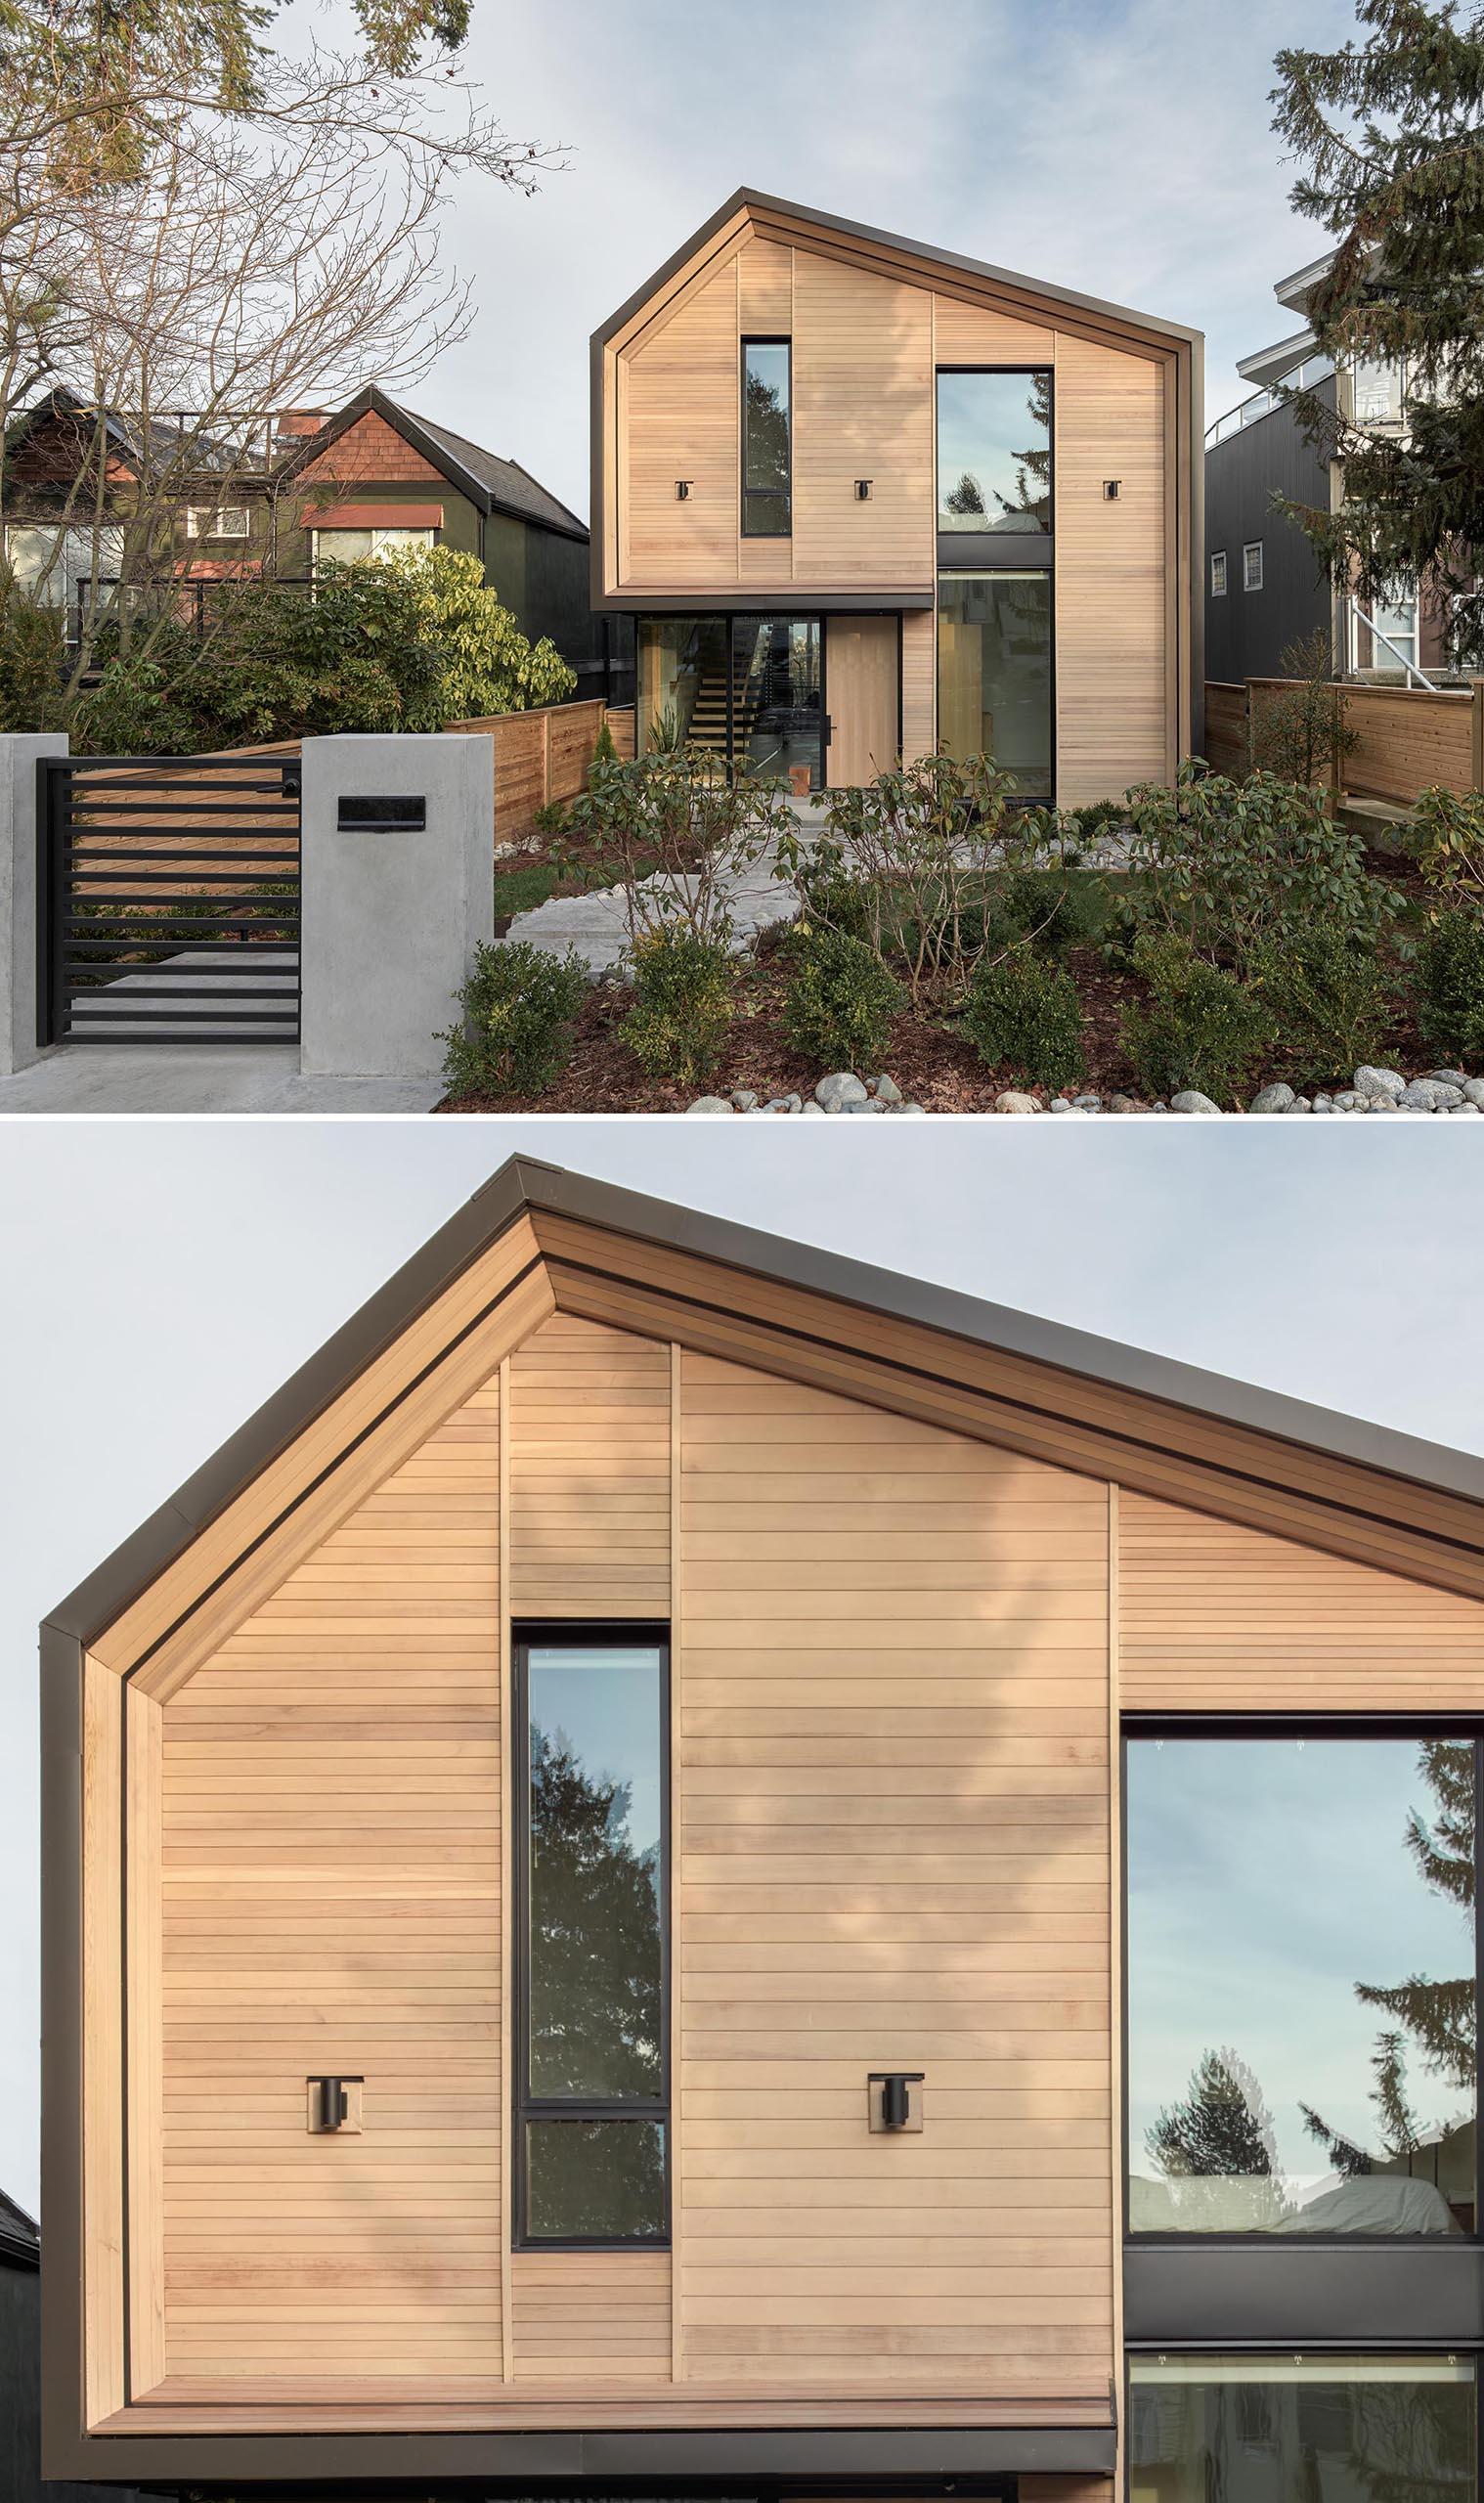 A modern house with a wood facade.